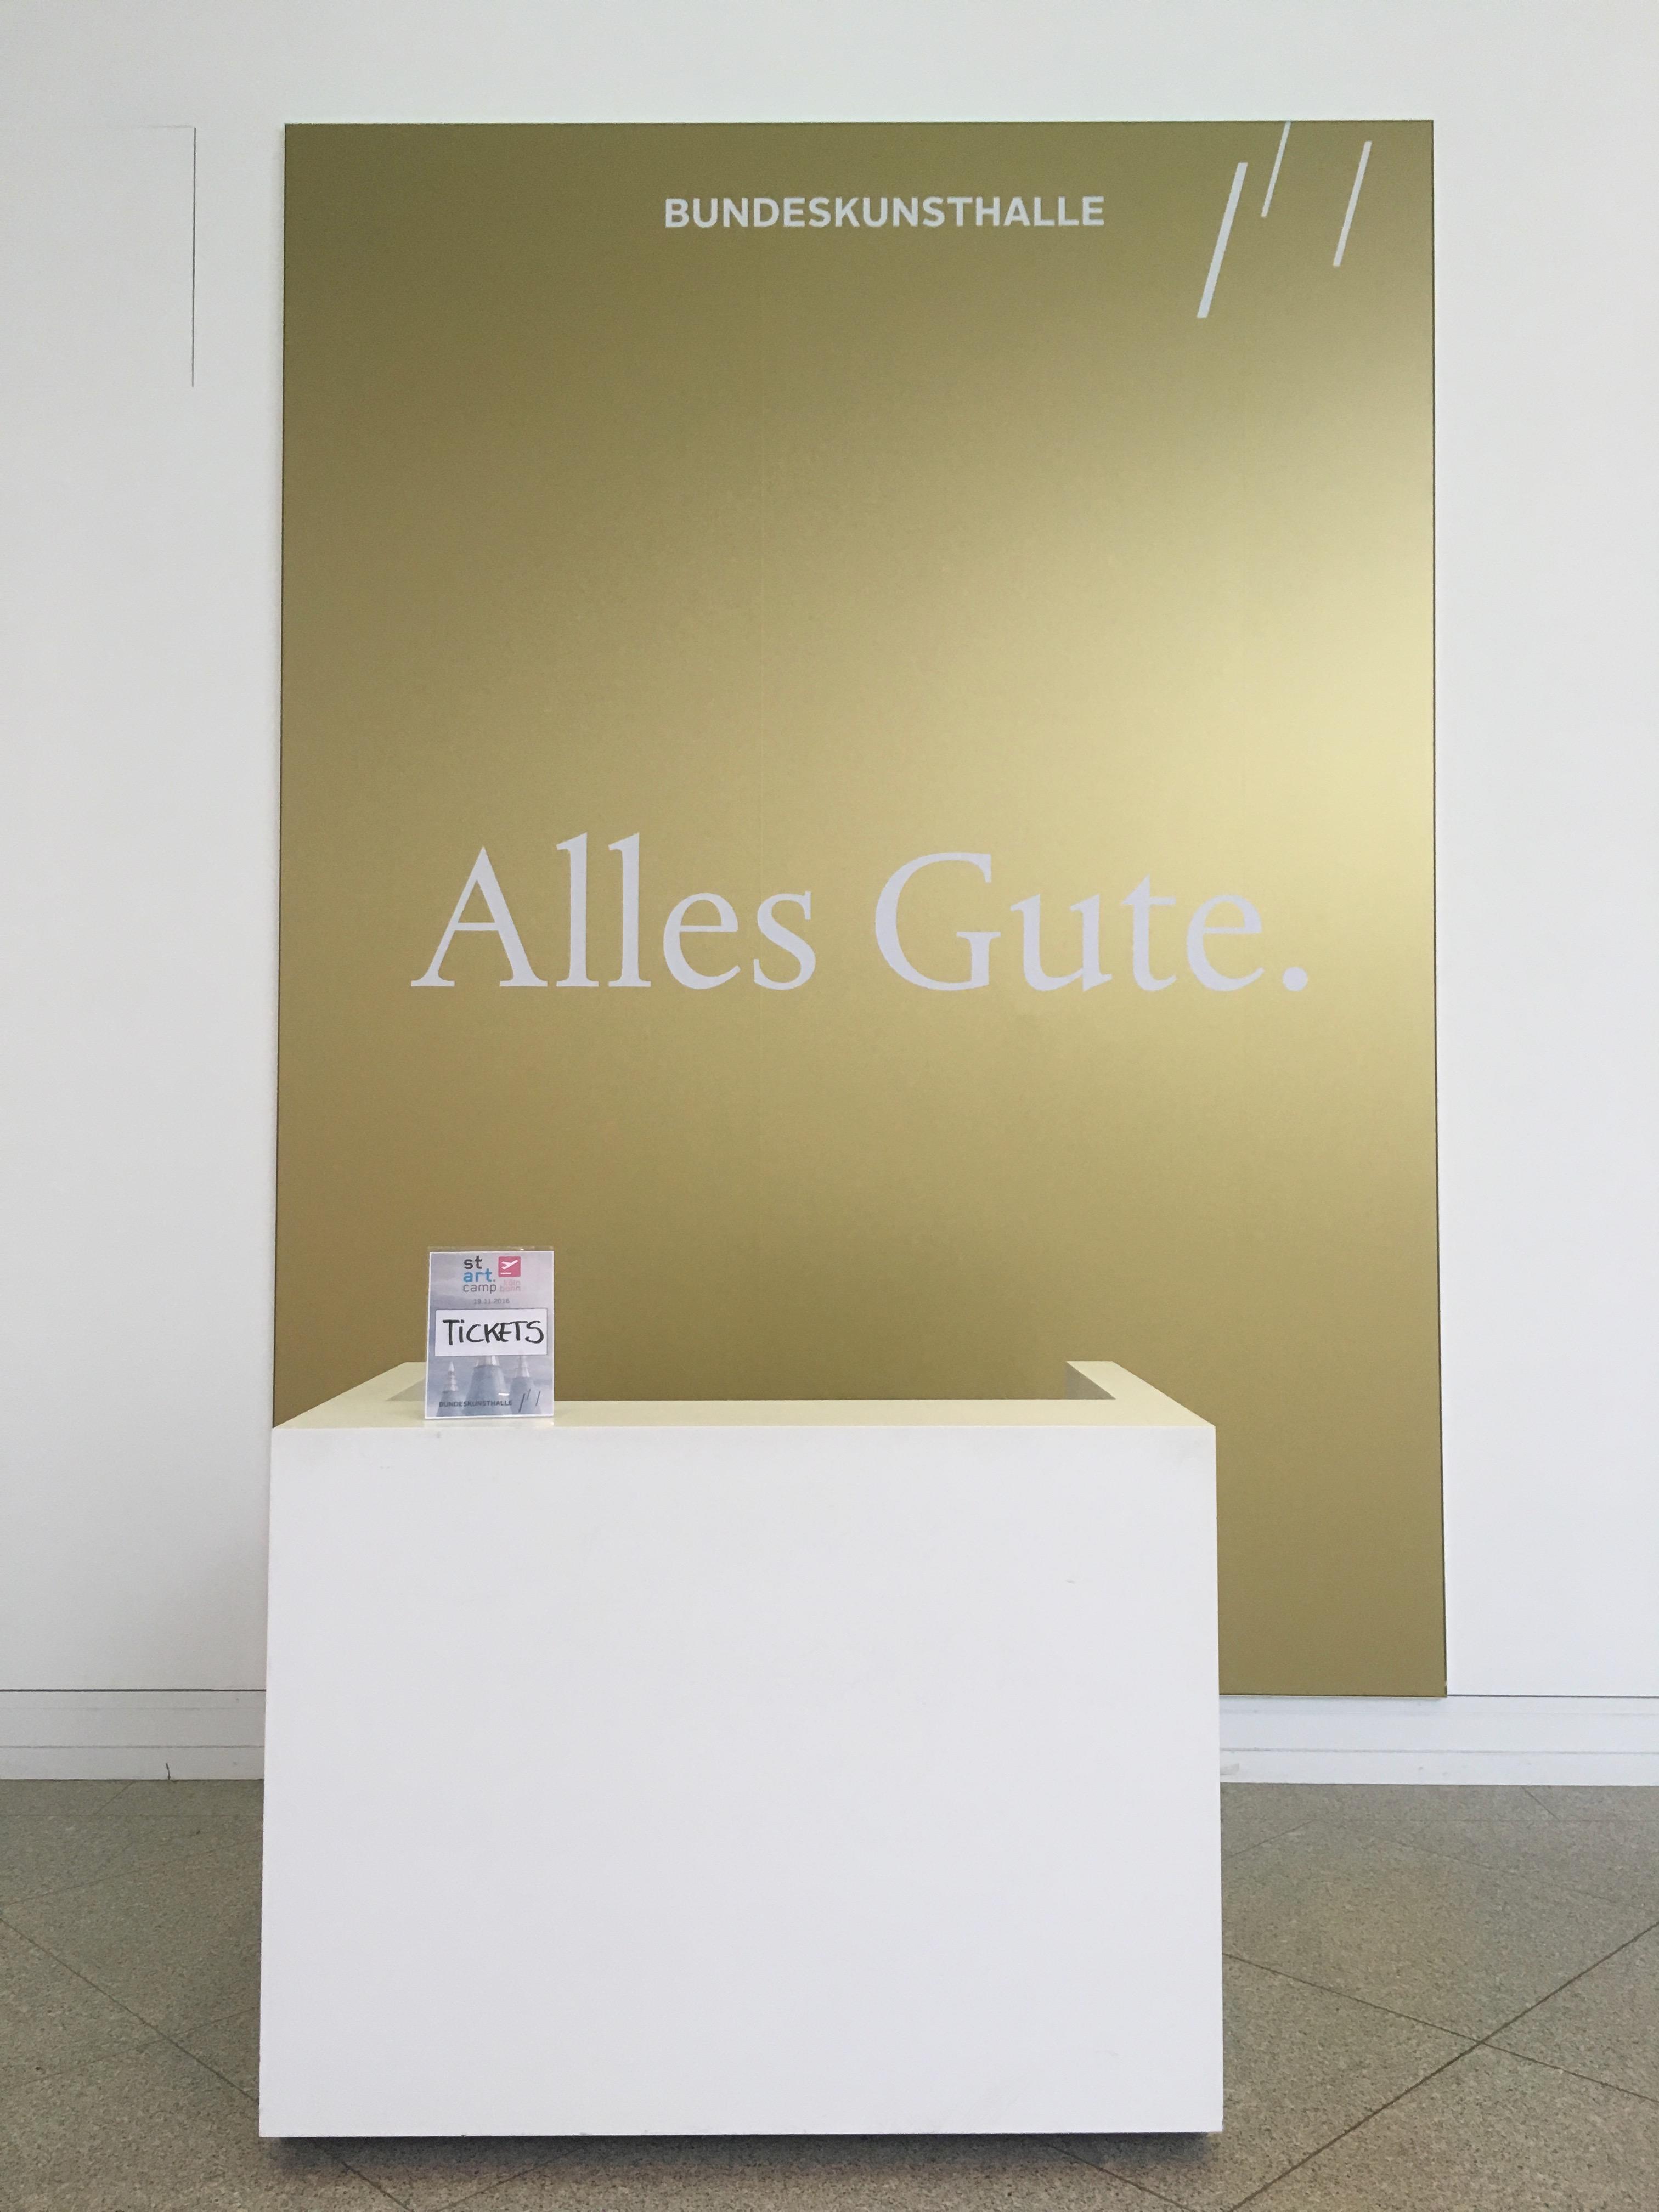 stARTcamp Köln-Bonn 2016 in der Bundeskunsthalle: Alles Gute!